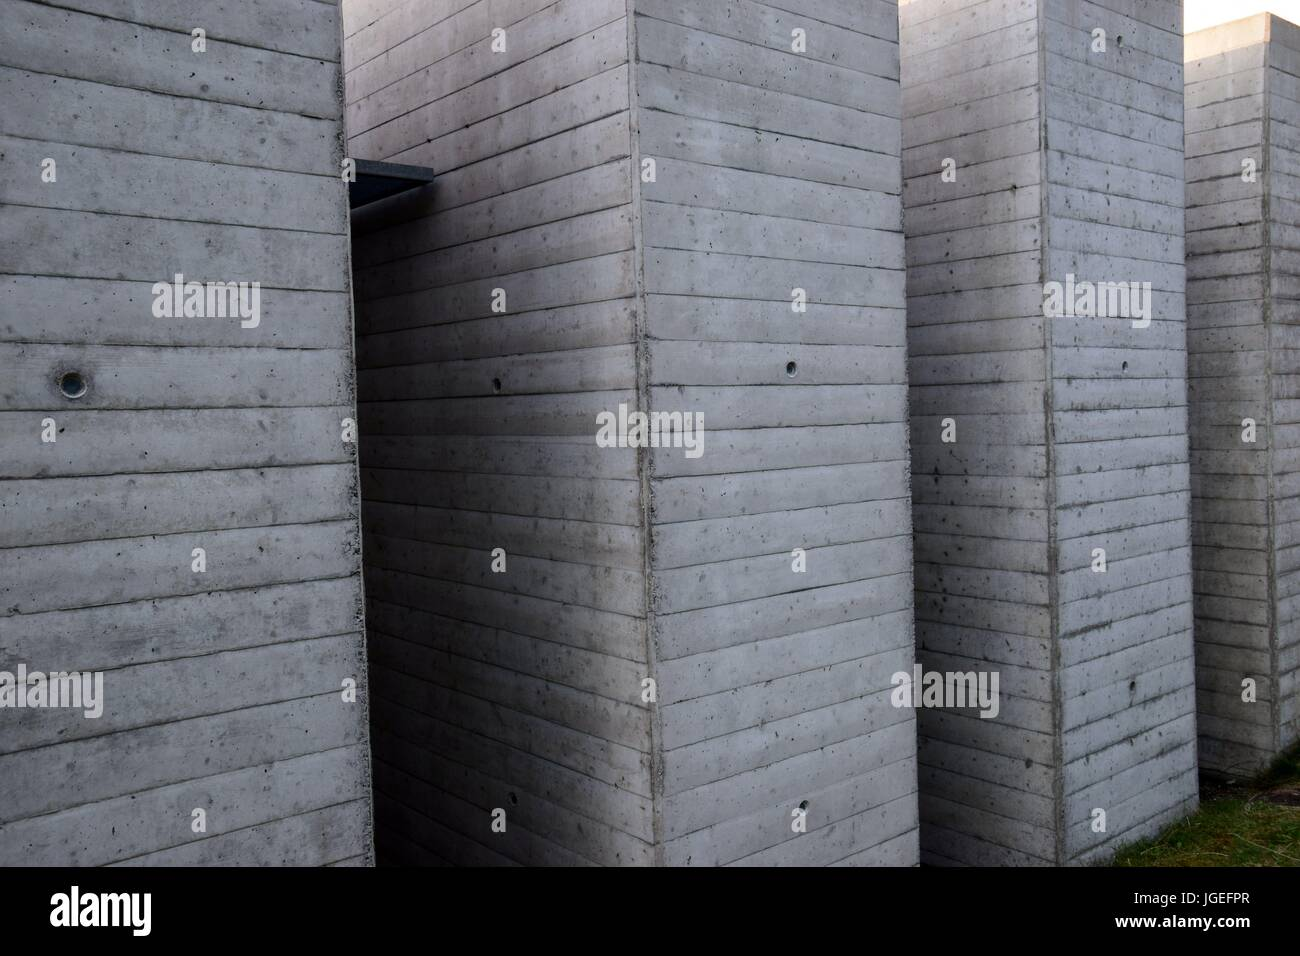 Betonwände mit Metall, concrete wall with metal, Brutalismus Stock Photo